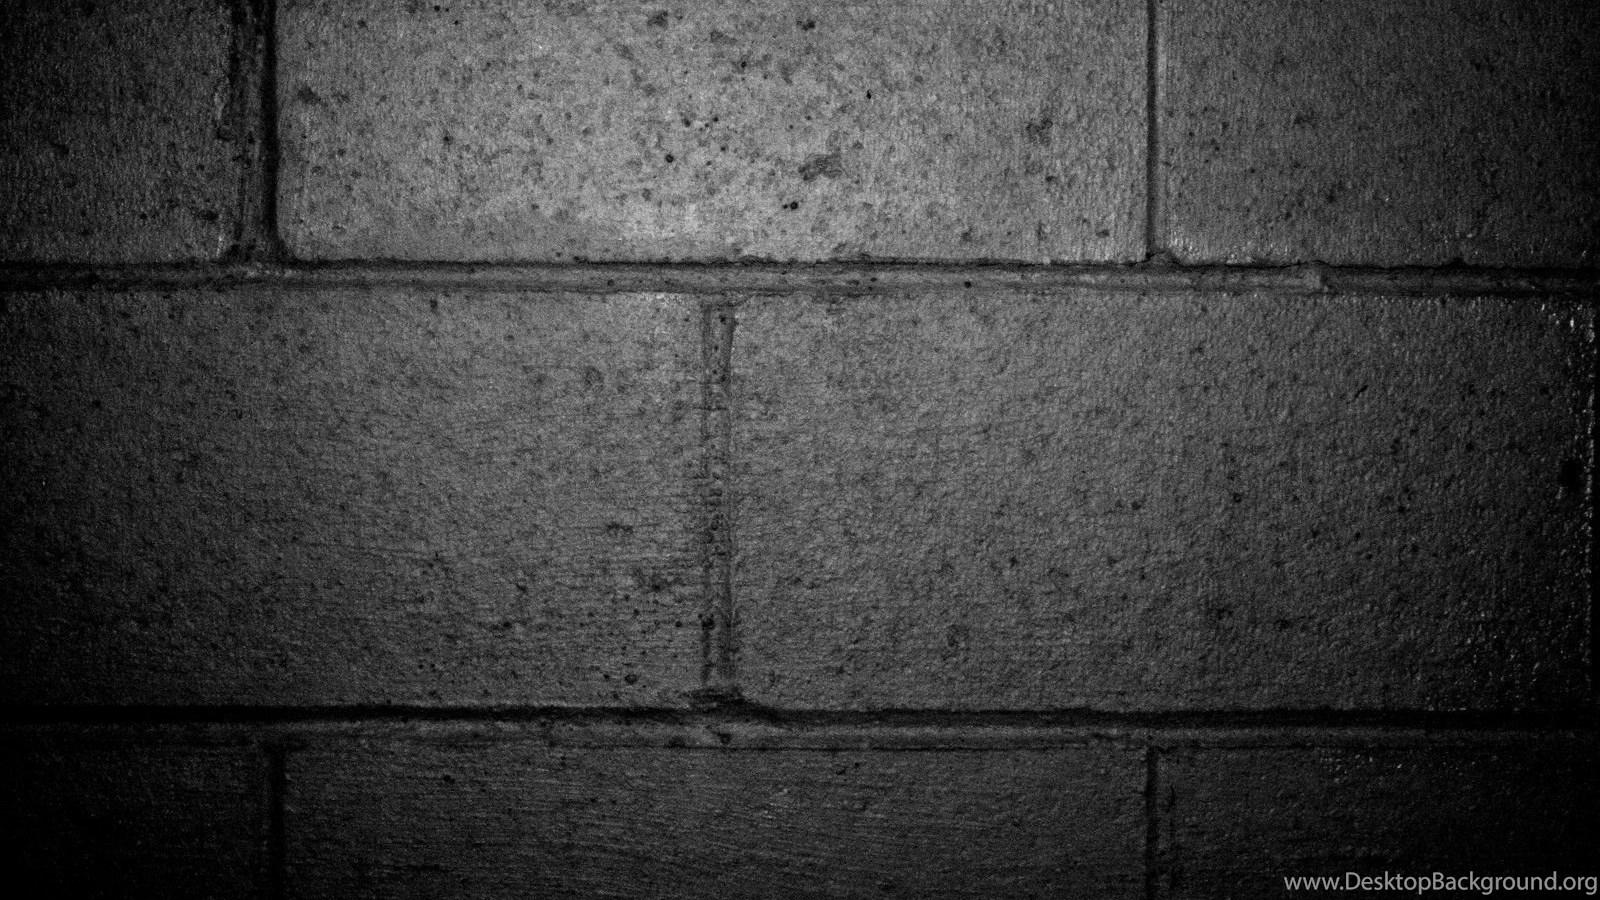 Download Grunge Texture Madsin Resources Stock Images Textures ... Desktop  Background